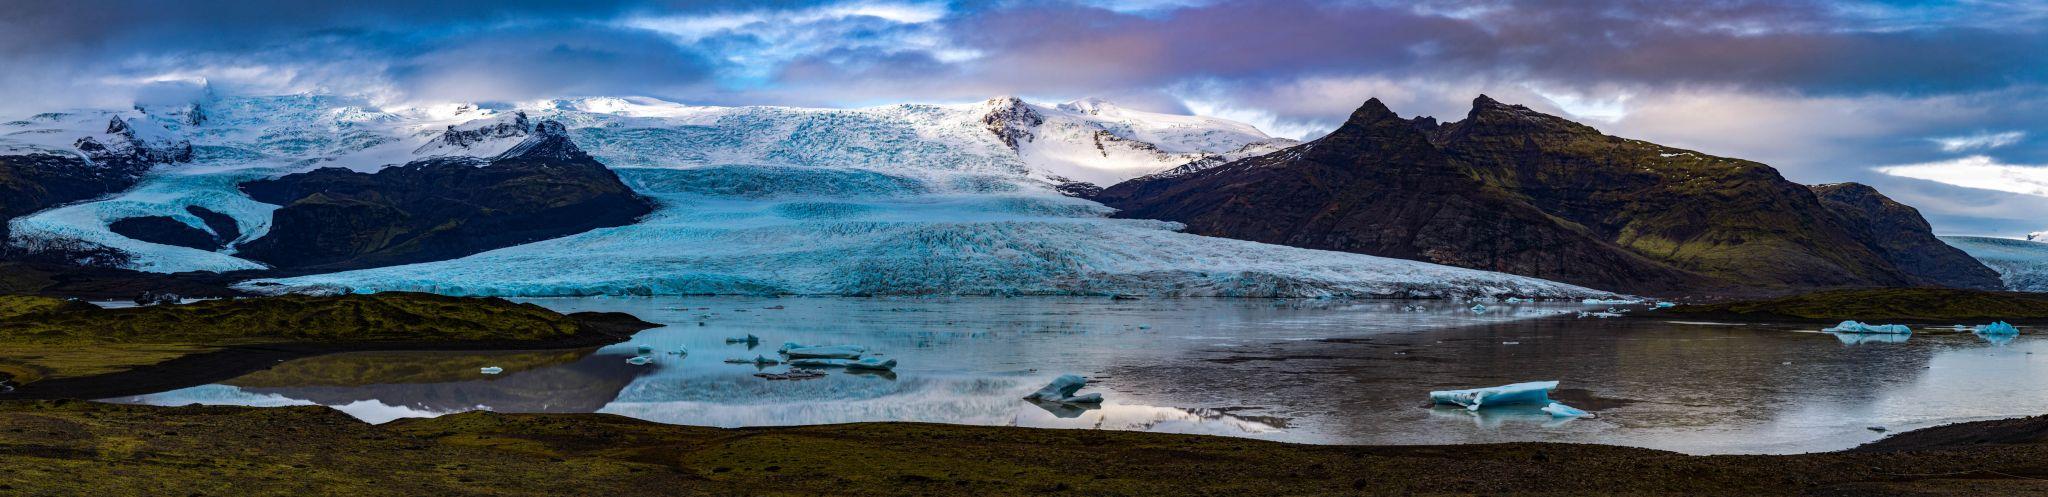 Fjallsárlon glacier lagoon, Iceland